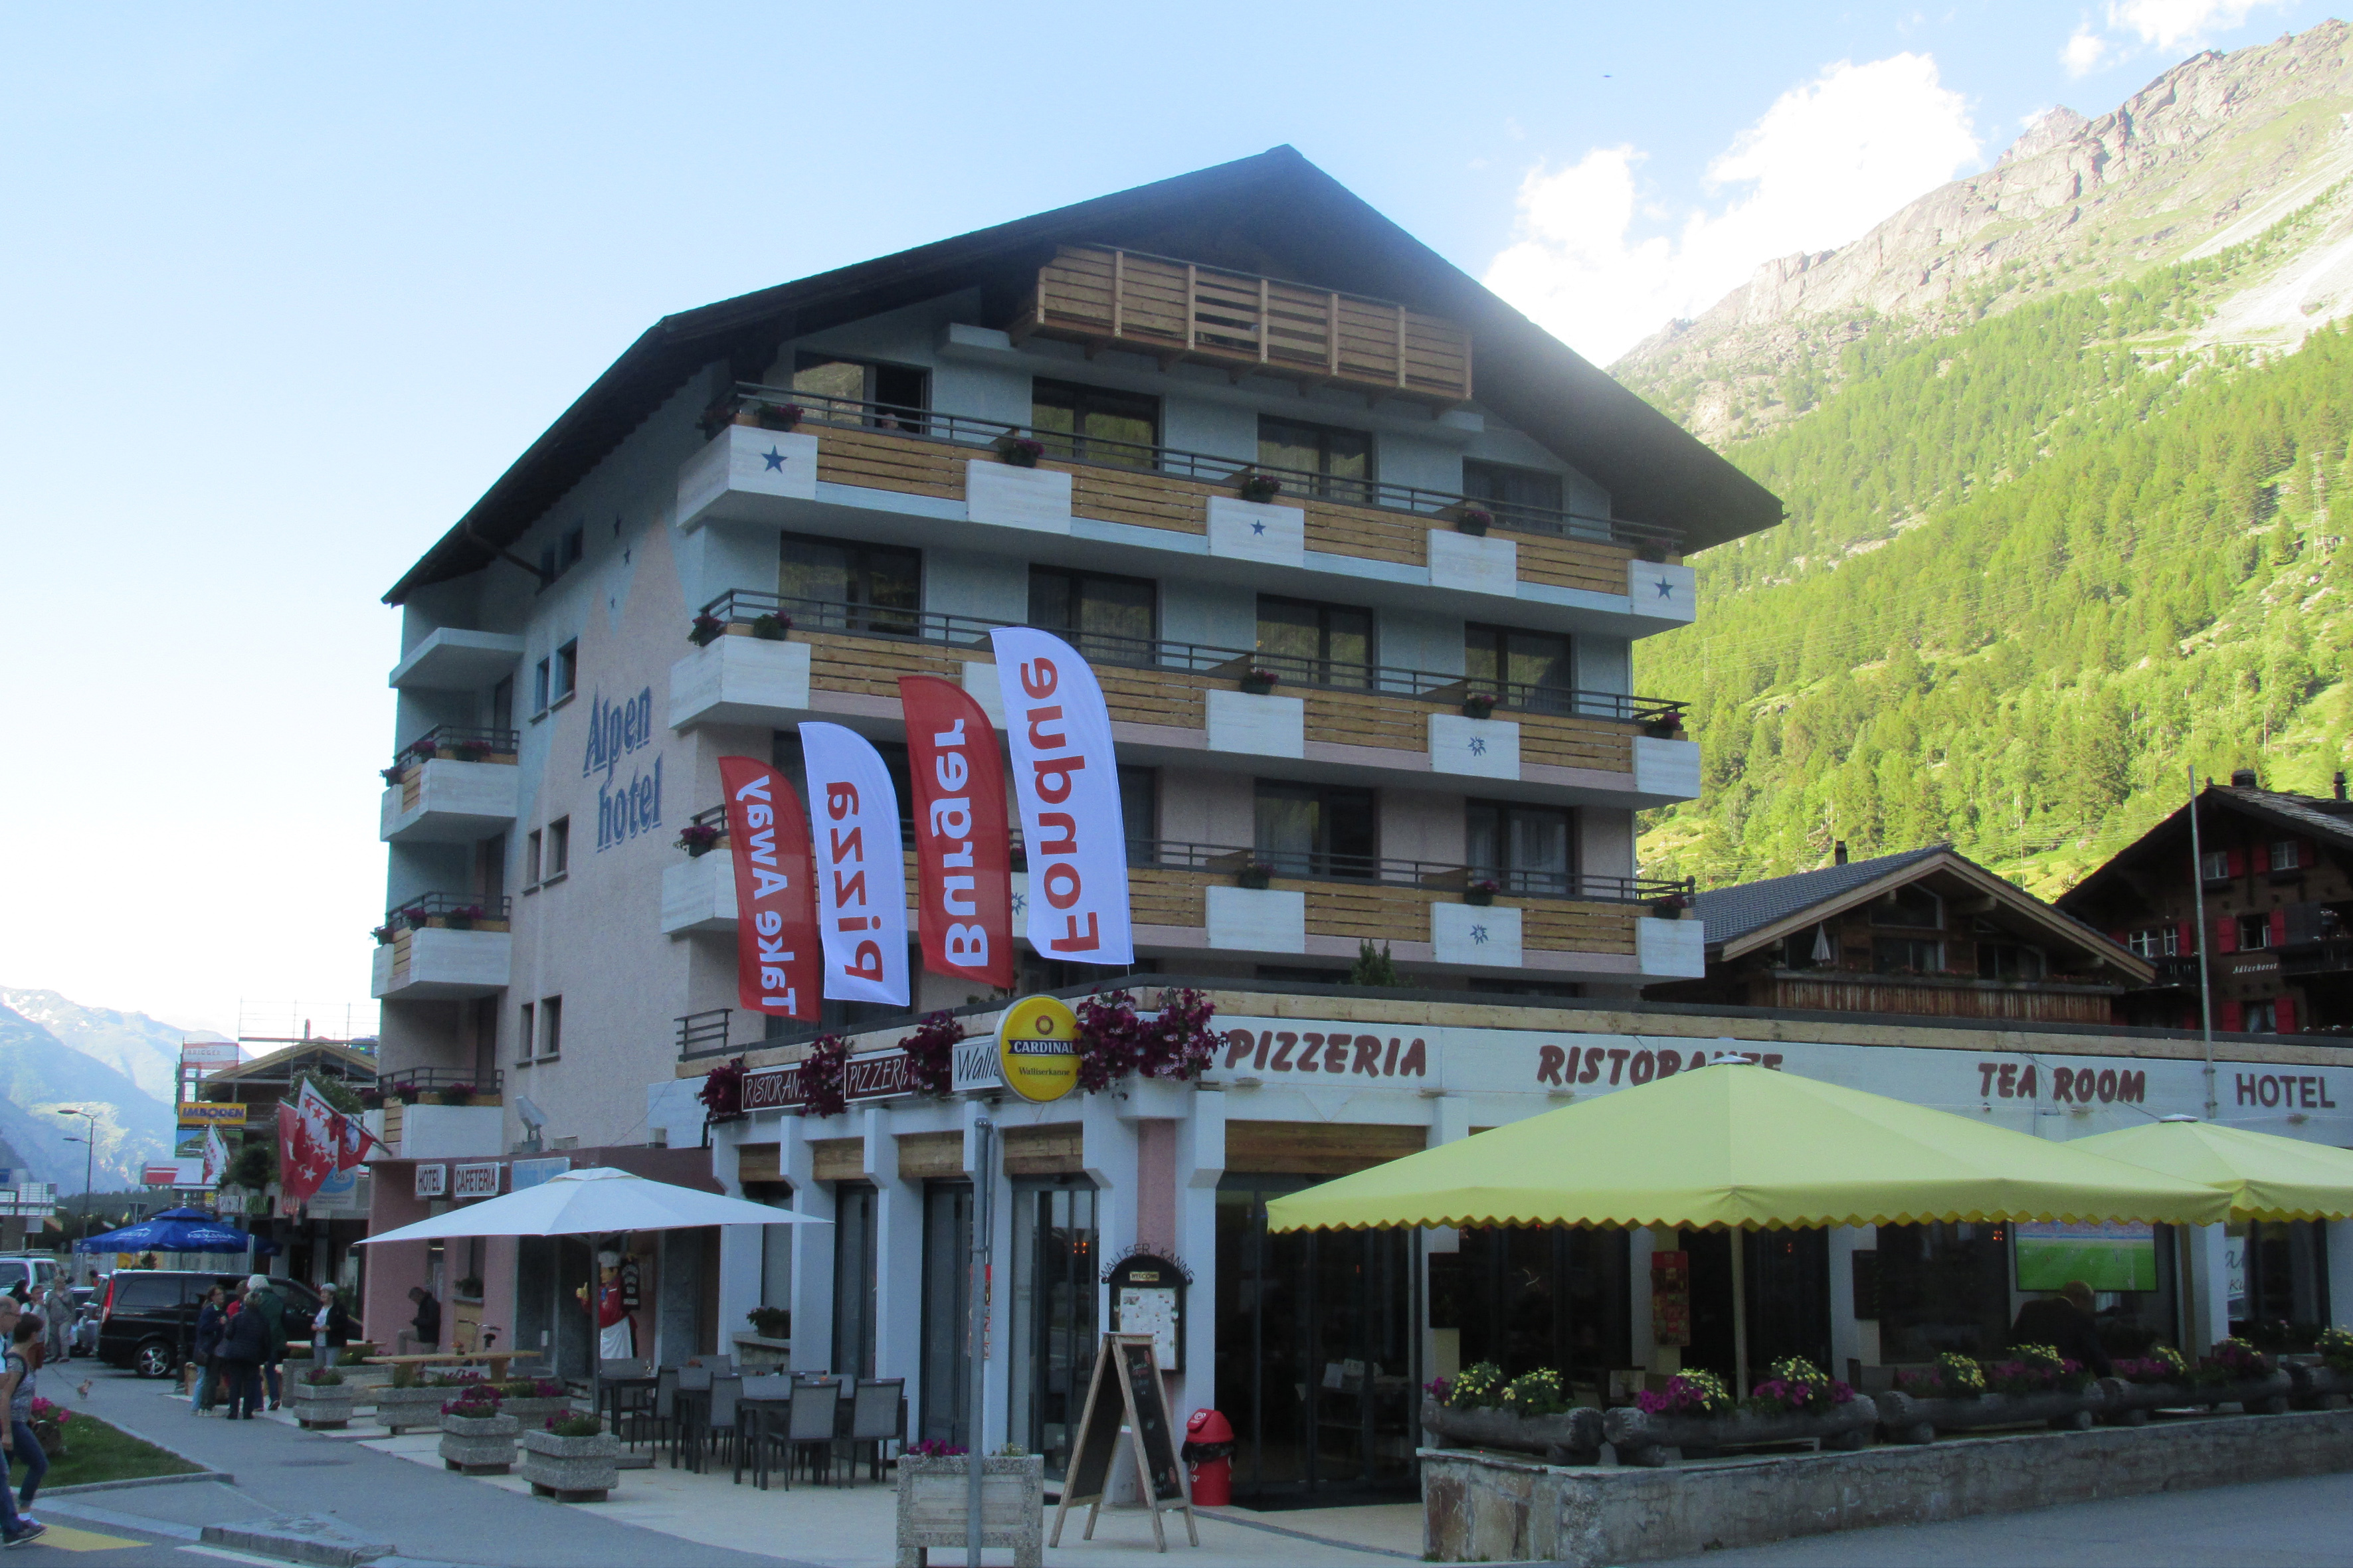 8 daagse wintersport vakantie naar Swiss Budget Alpenhotel in tasch, zwitserland